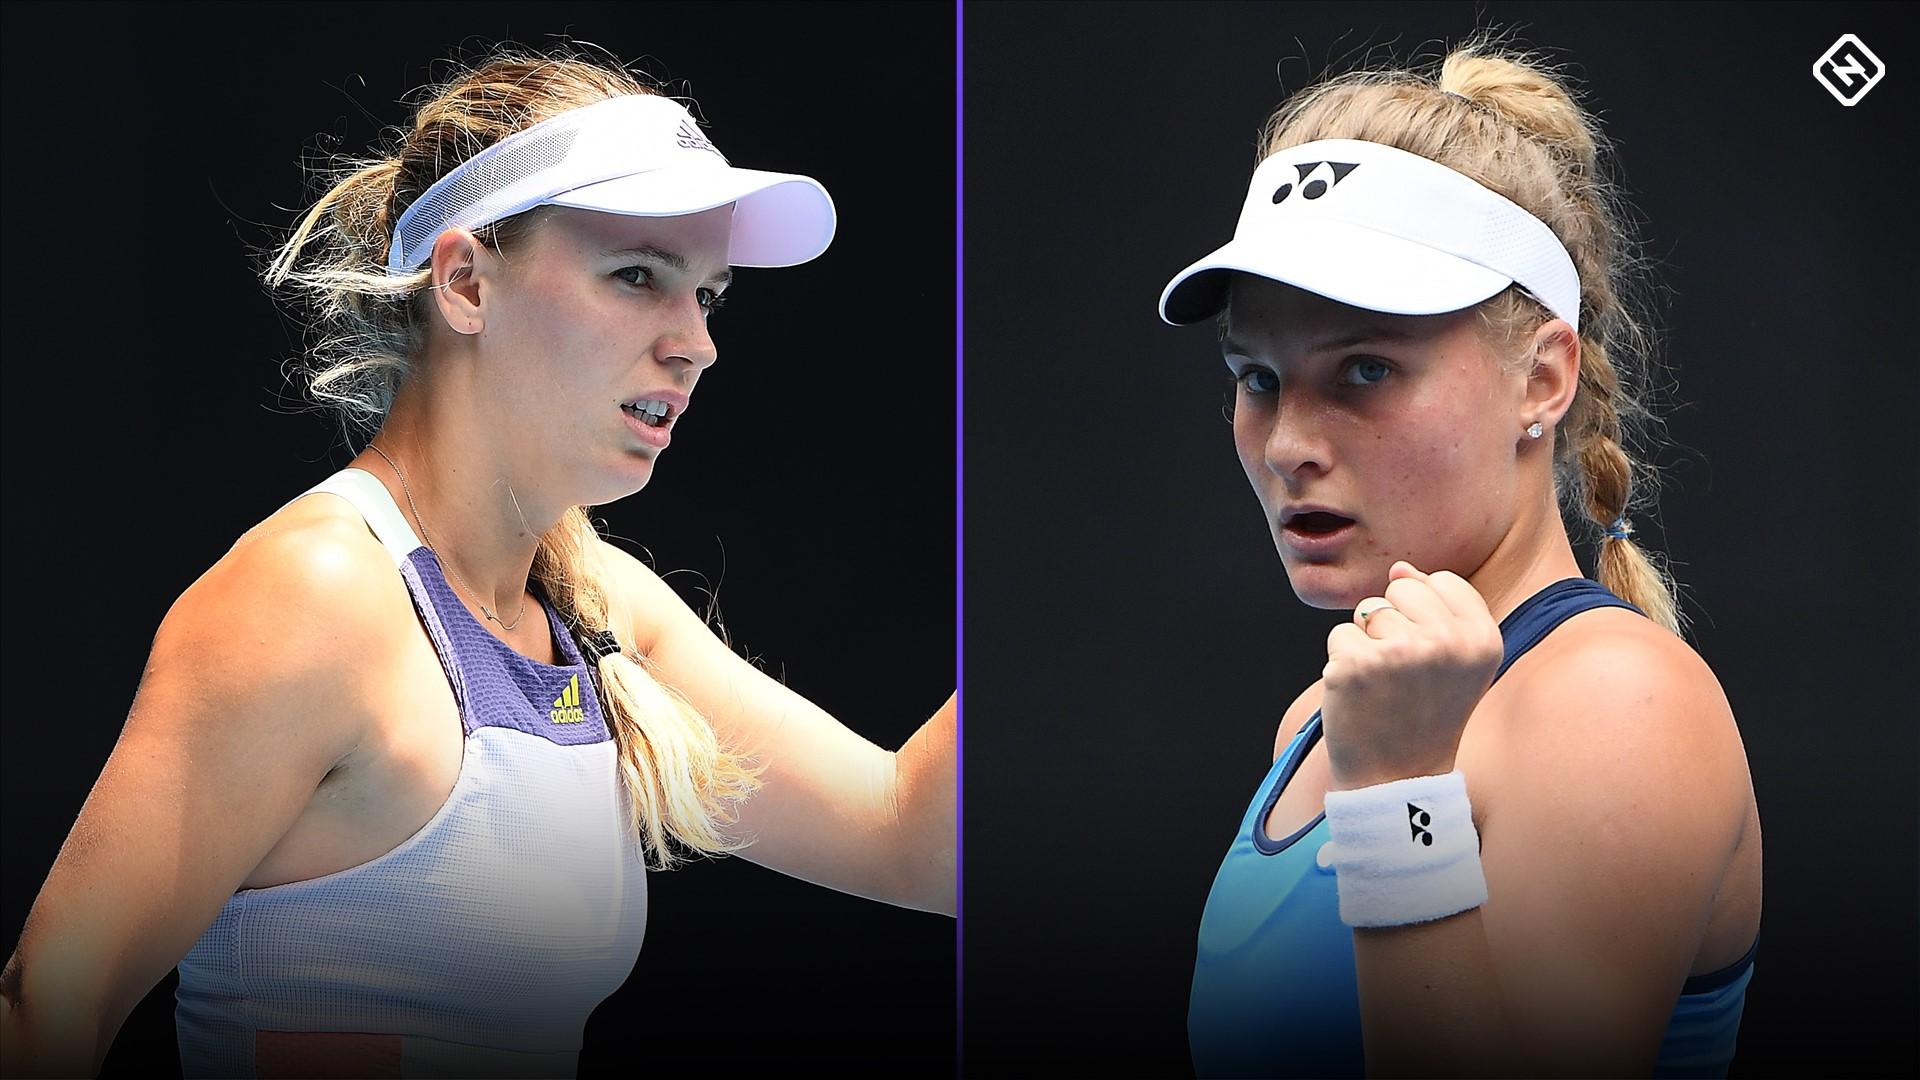 Australian Open: Dayama Yastremska claps back at Caroline Wozniacki amid faking accustations